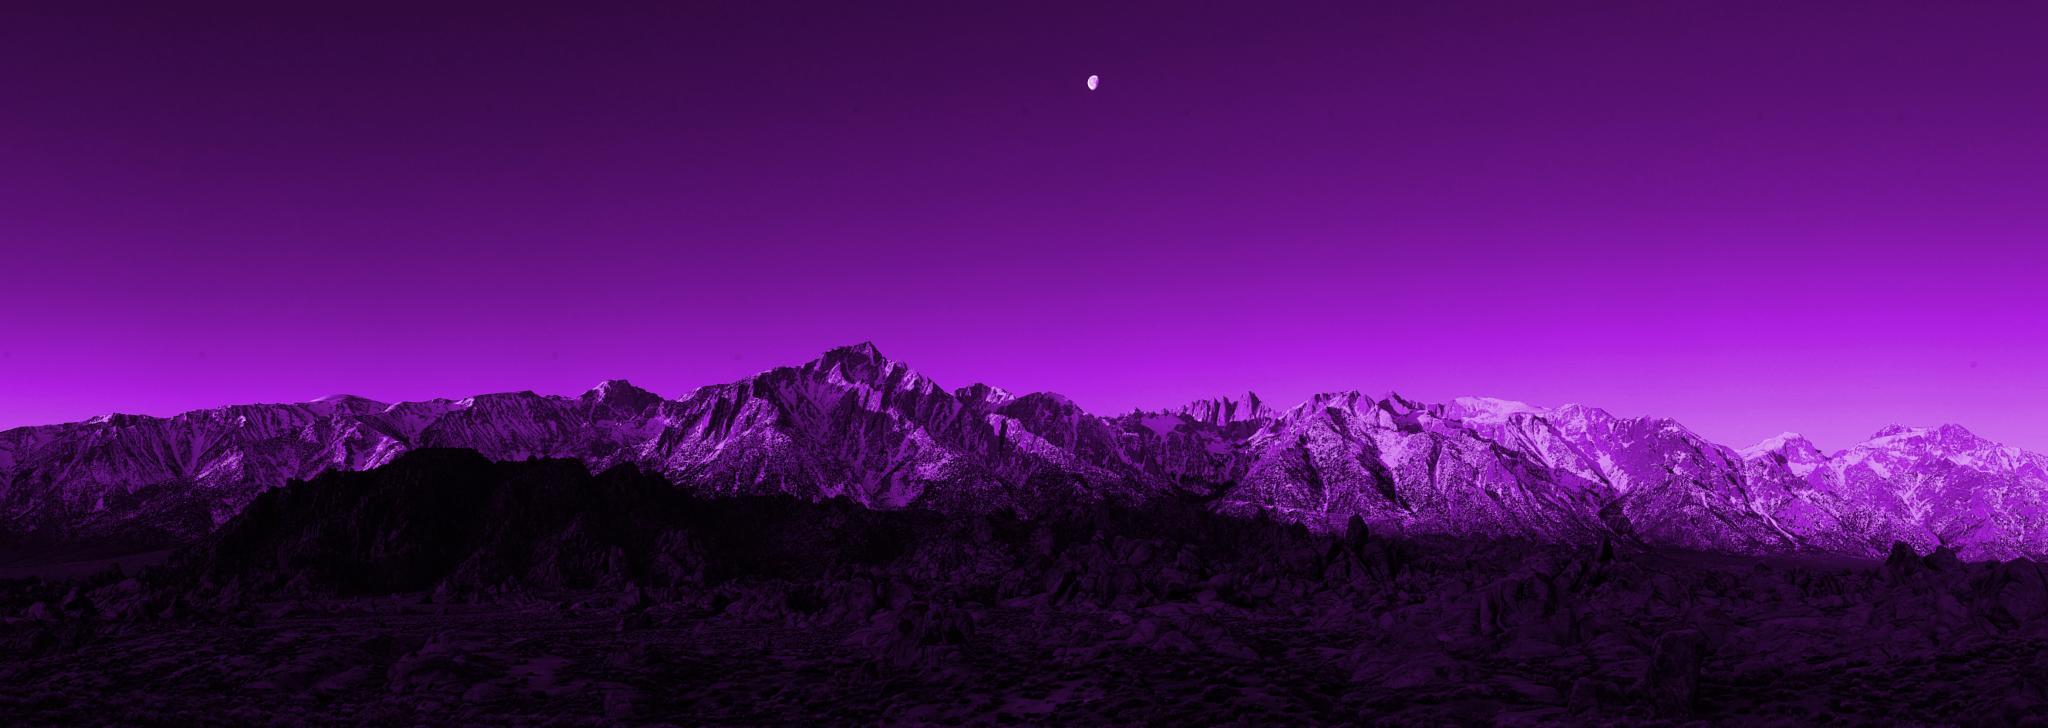 purple world by Zarina Gharghash